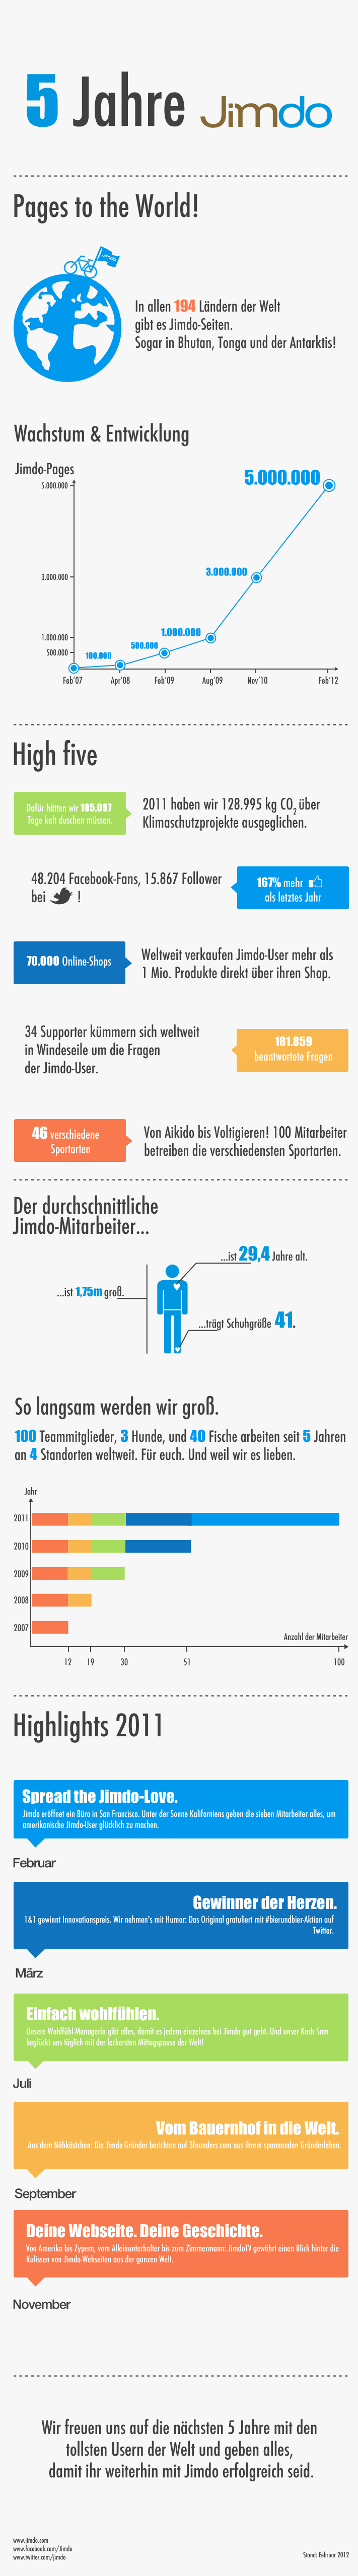 infografik_de.jpg